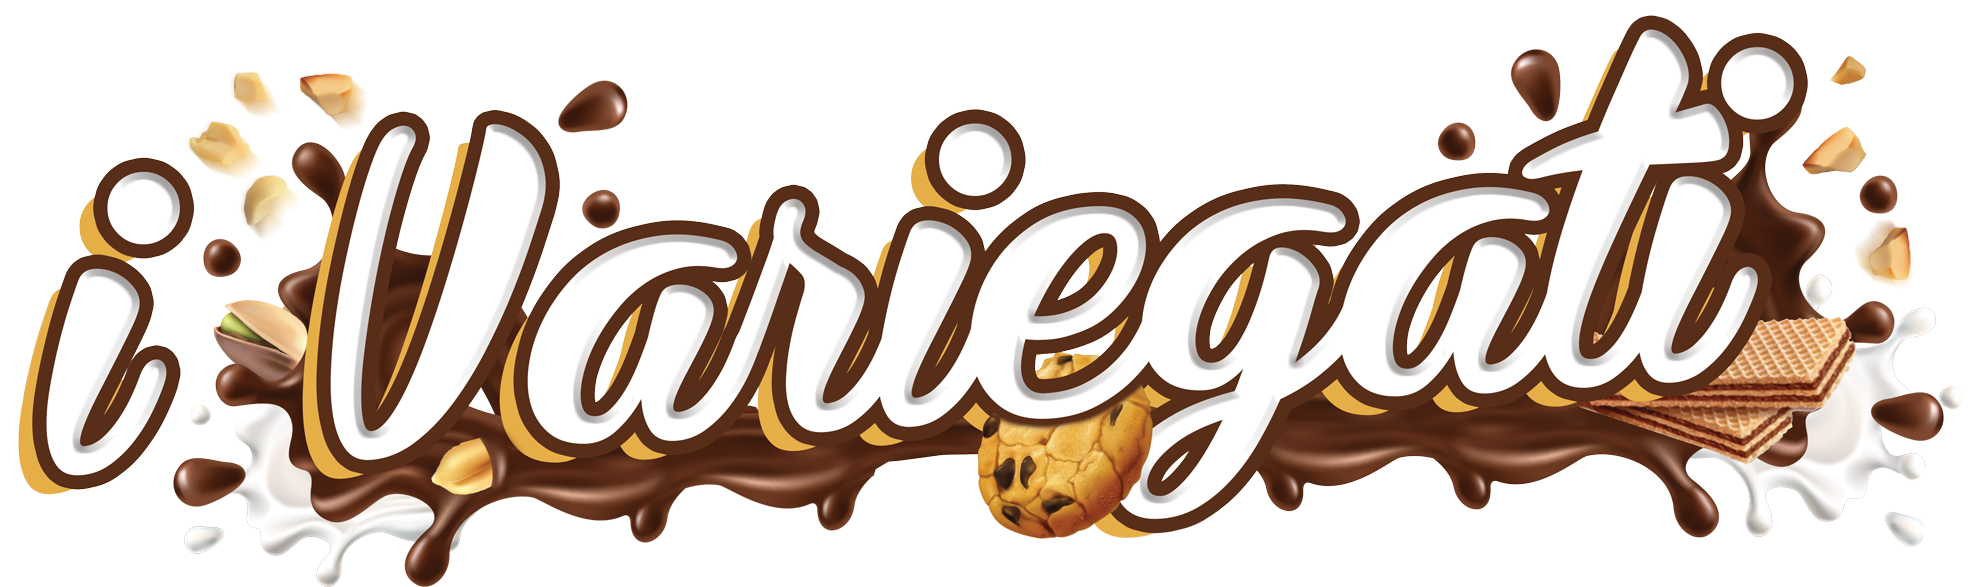 Variegati Gelato Yogurt Pasticceria - Pastry Ice Cream Variegate Nappi